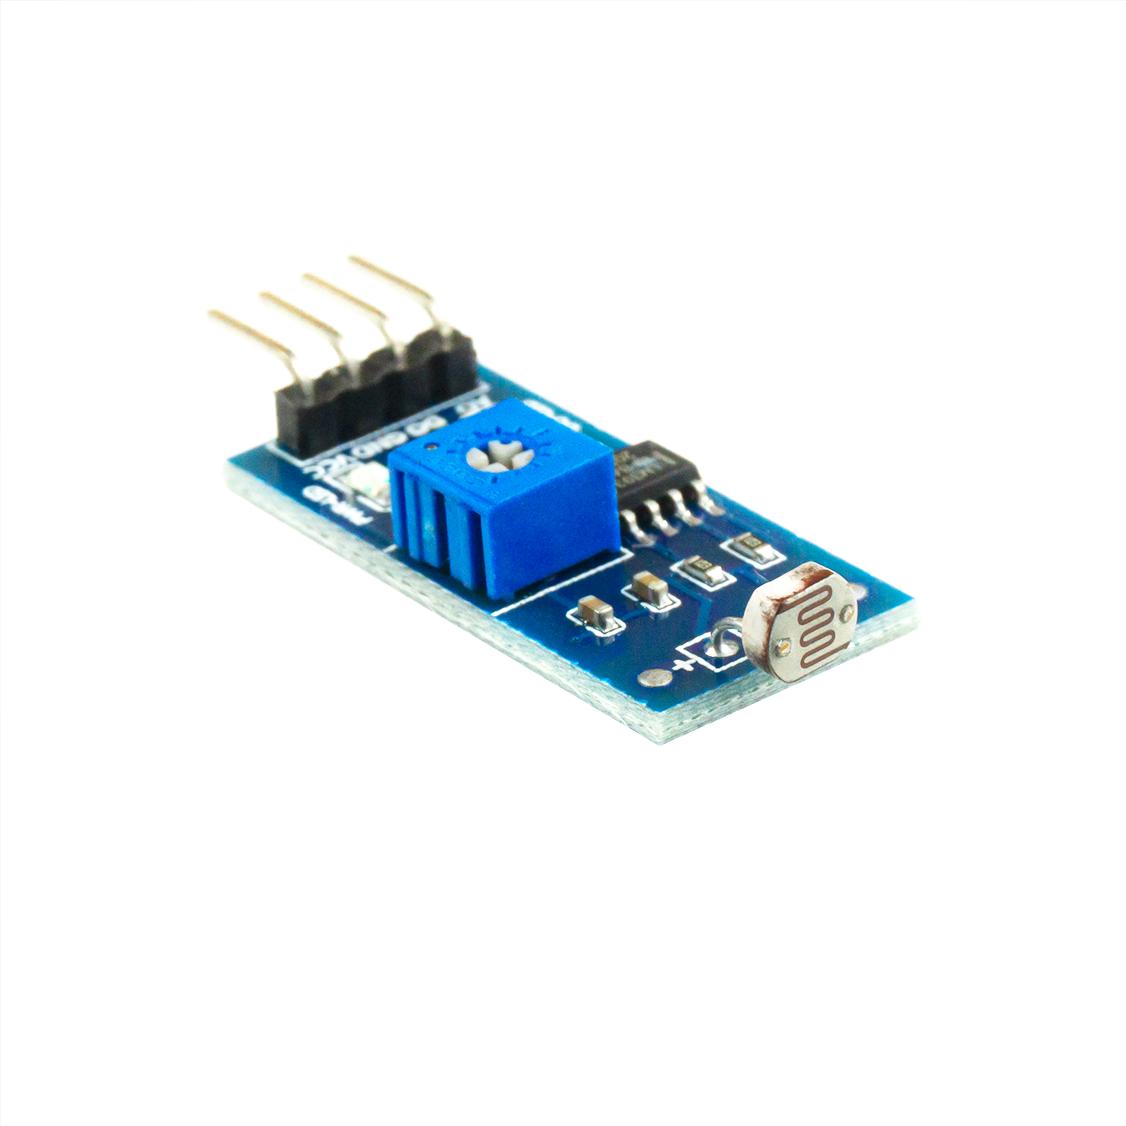 MSP-107 - Lichtsensor Helligkeitssensor Digital - Analog - Sensor